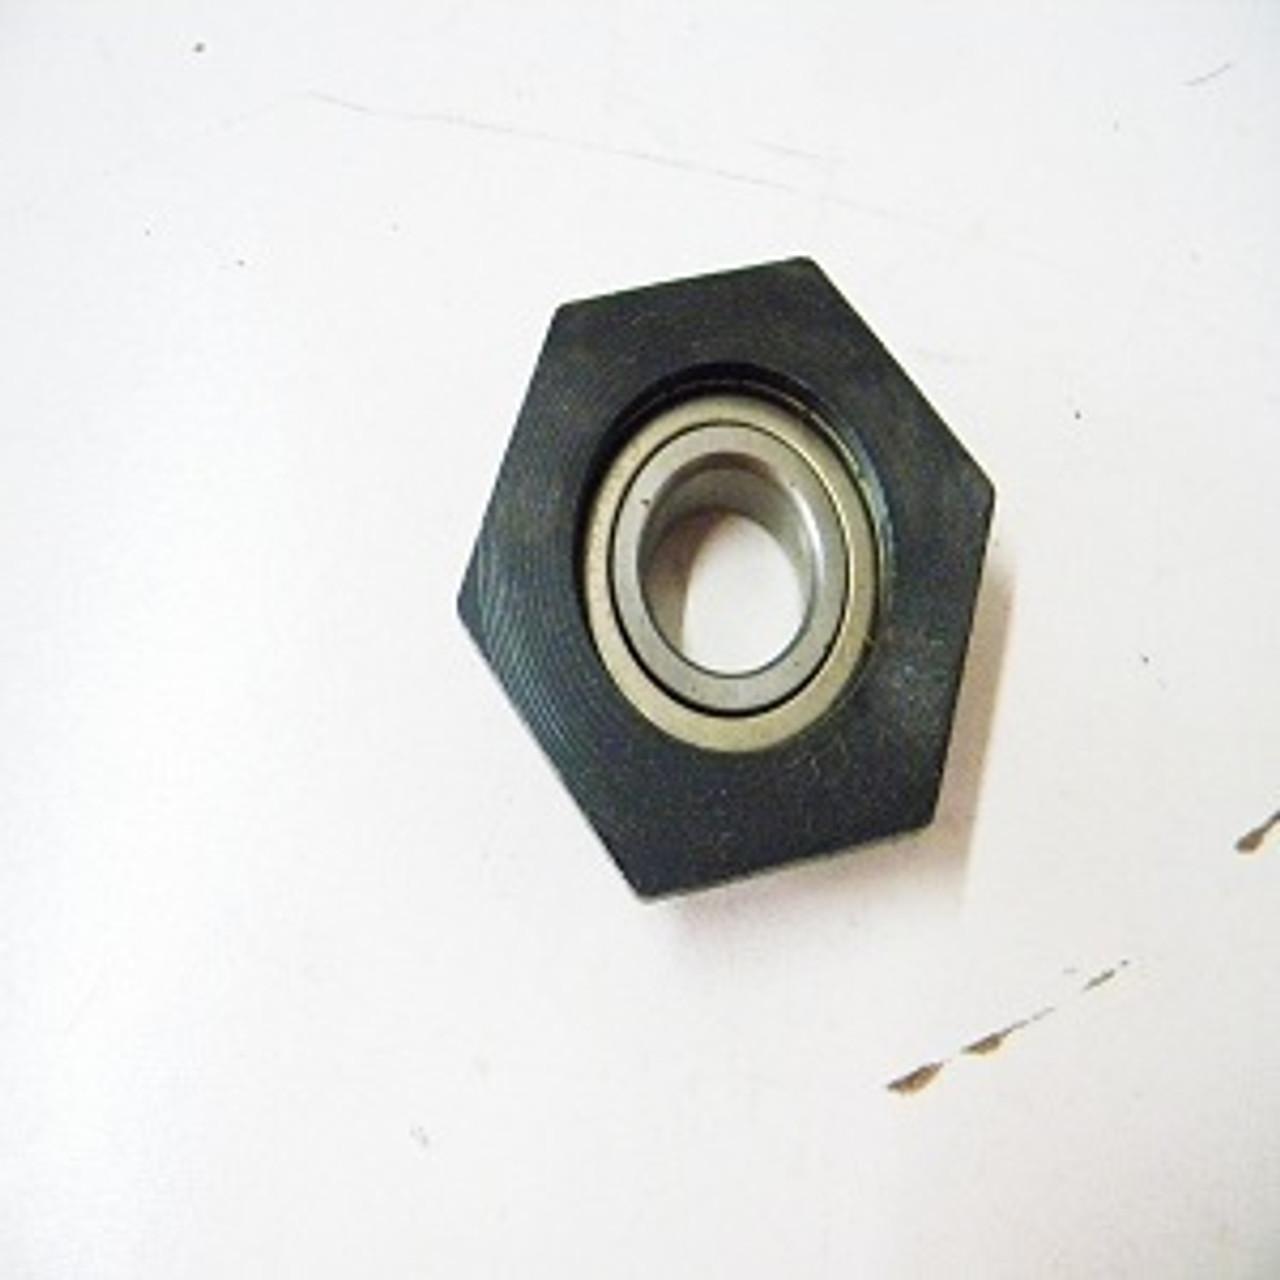 ProForm Model PFEL779083 SPACESAVER DX Elliptical Drive Belt Part 144335